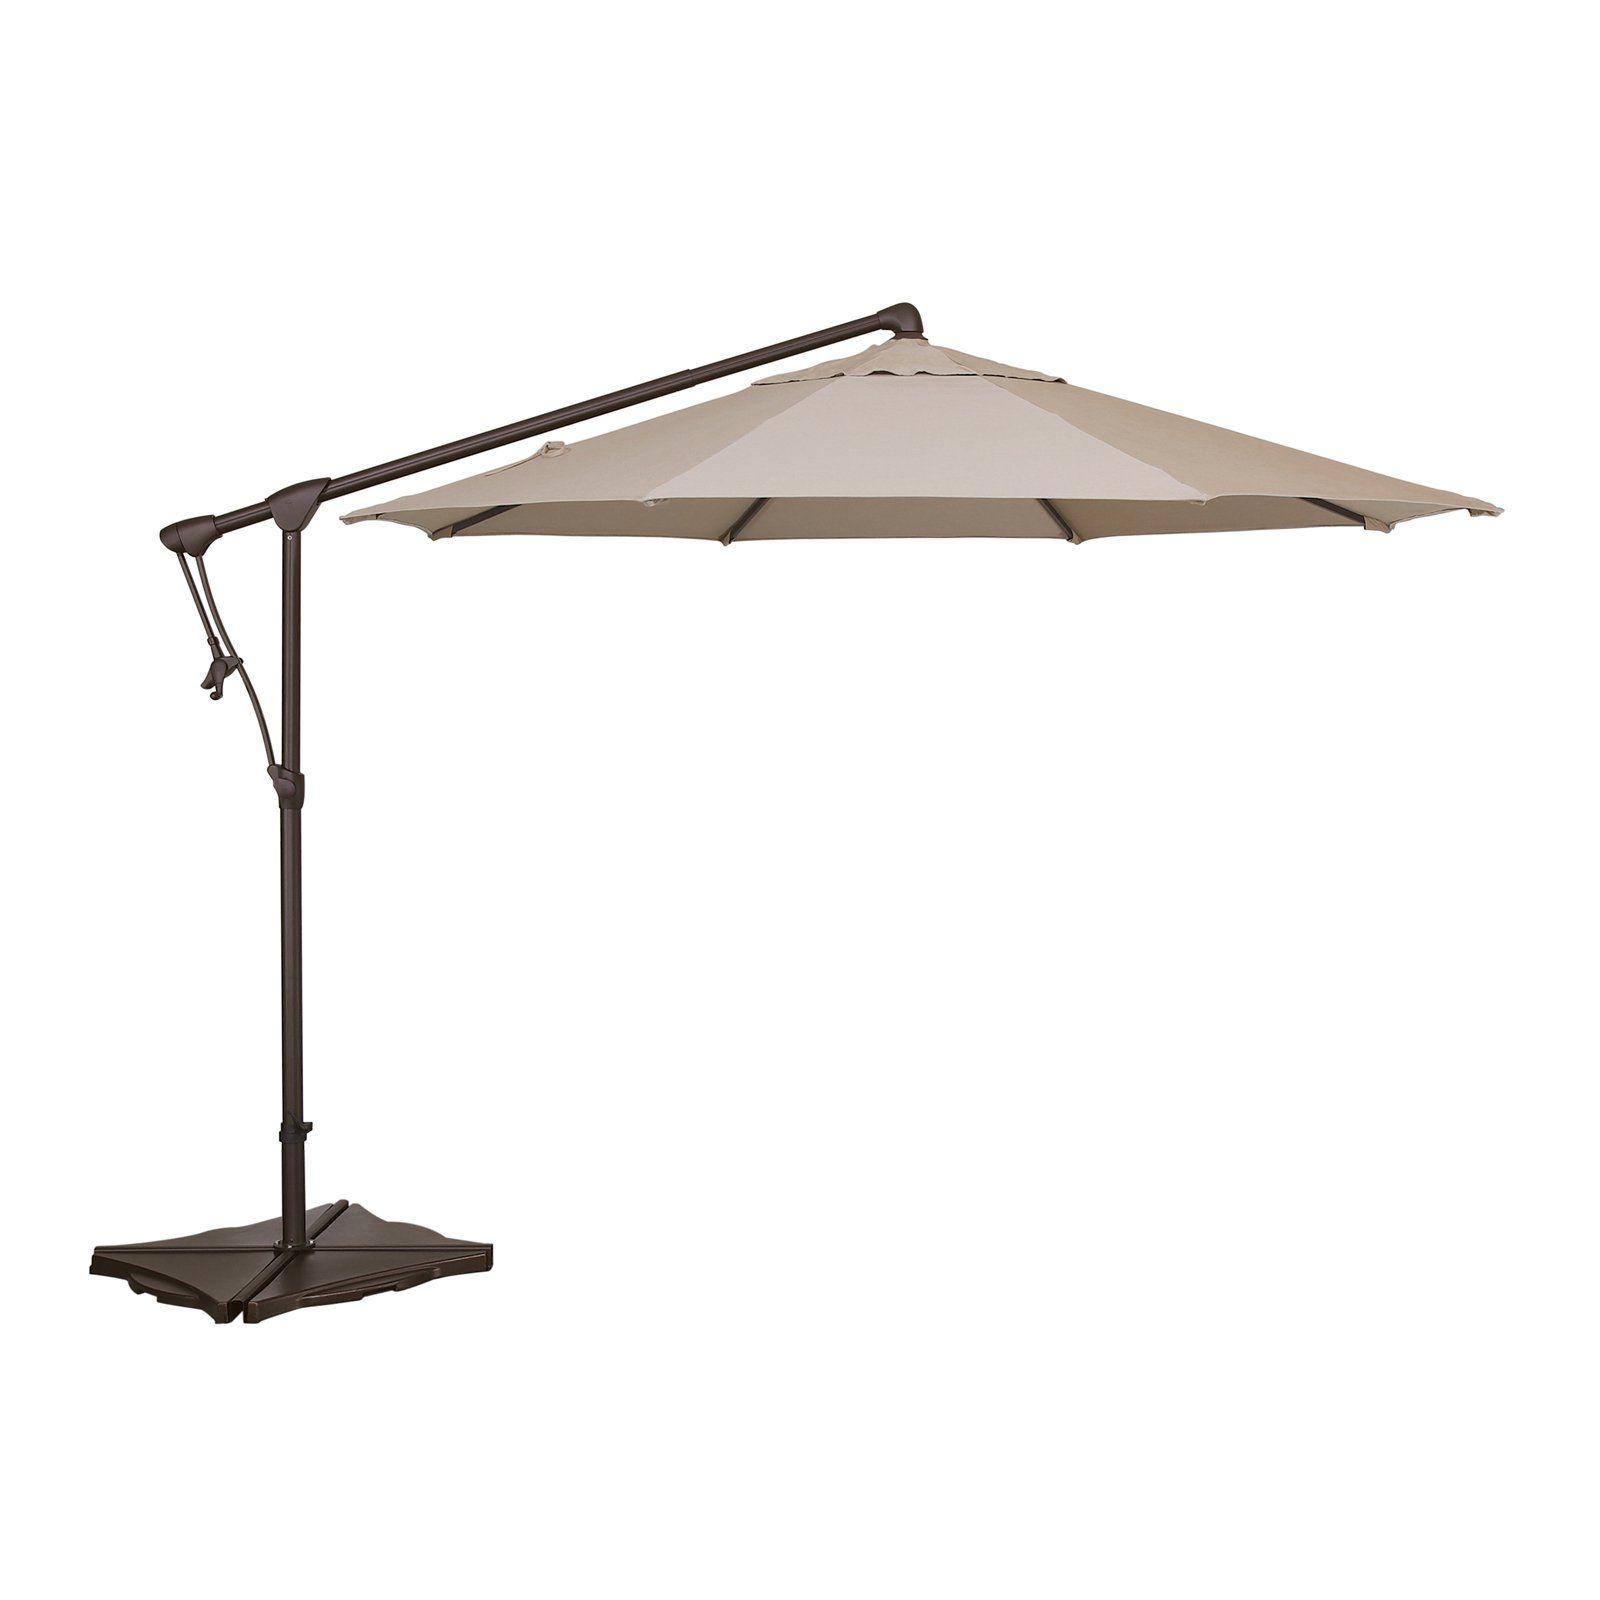 Treasure Garden 10 Ft Sunbrella Offset Patio Umbrella Antique Beige Offset Patio Umbrella Patio Umbrella Patio